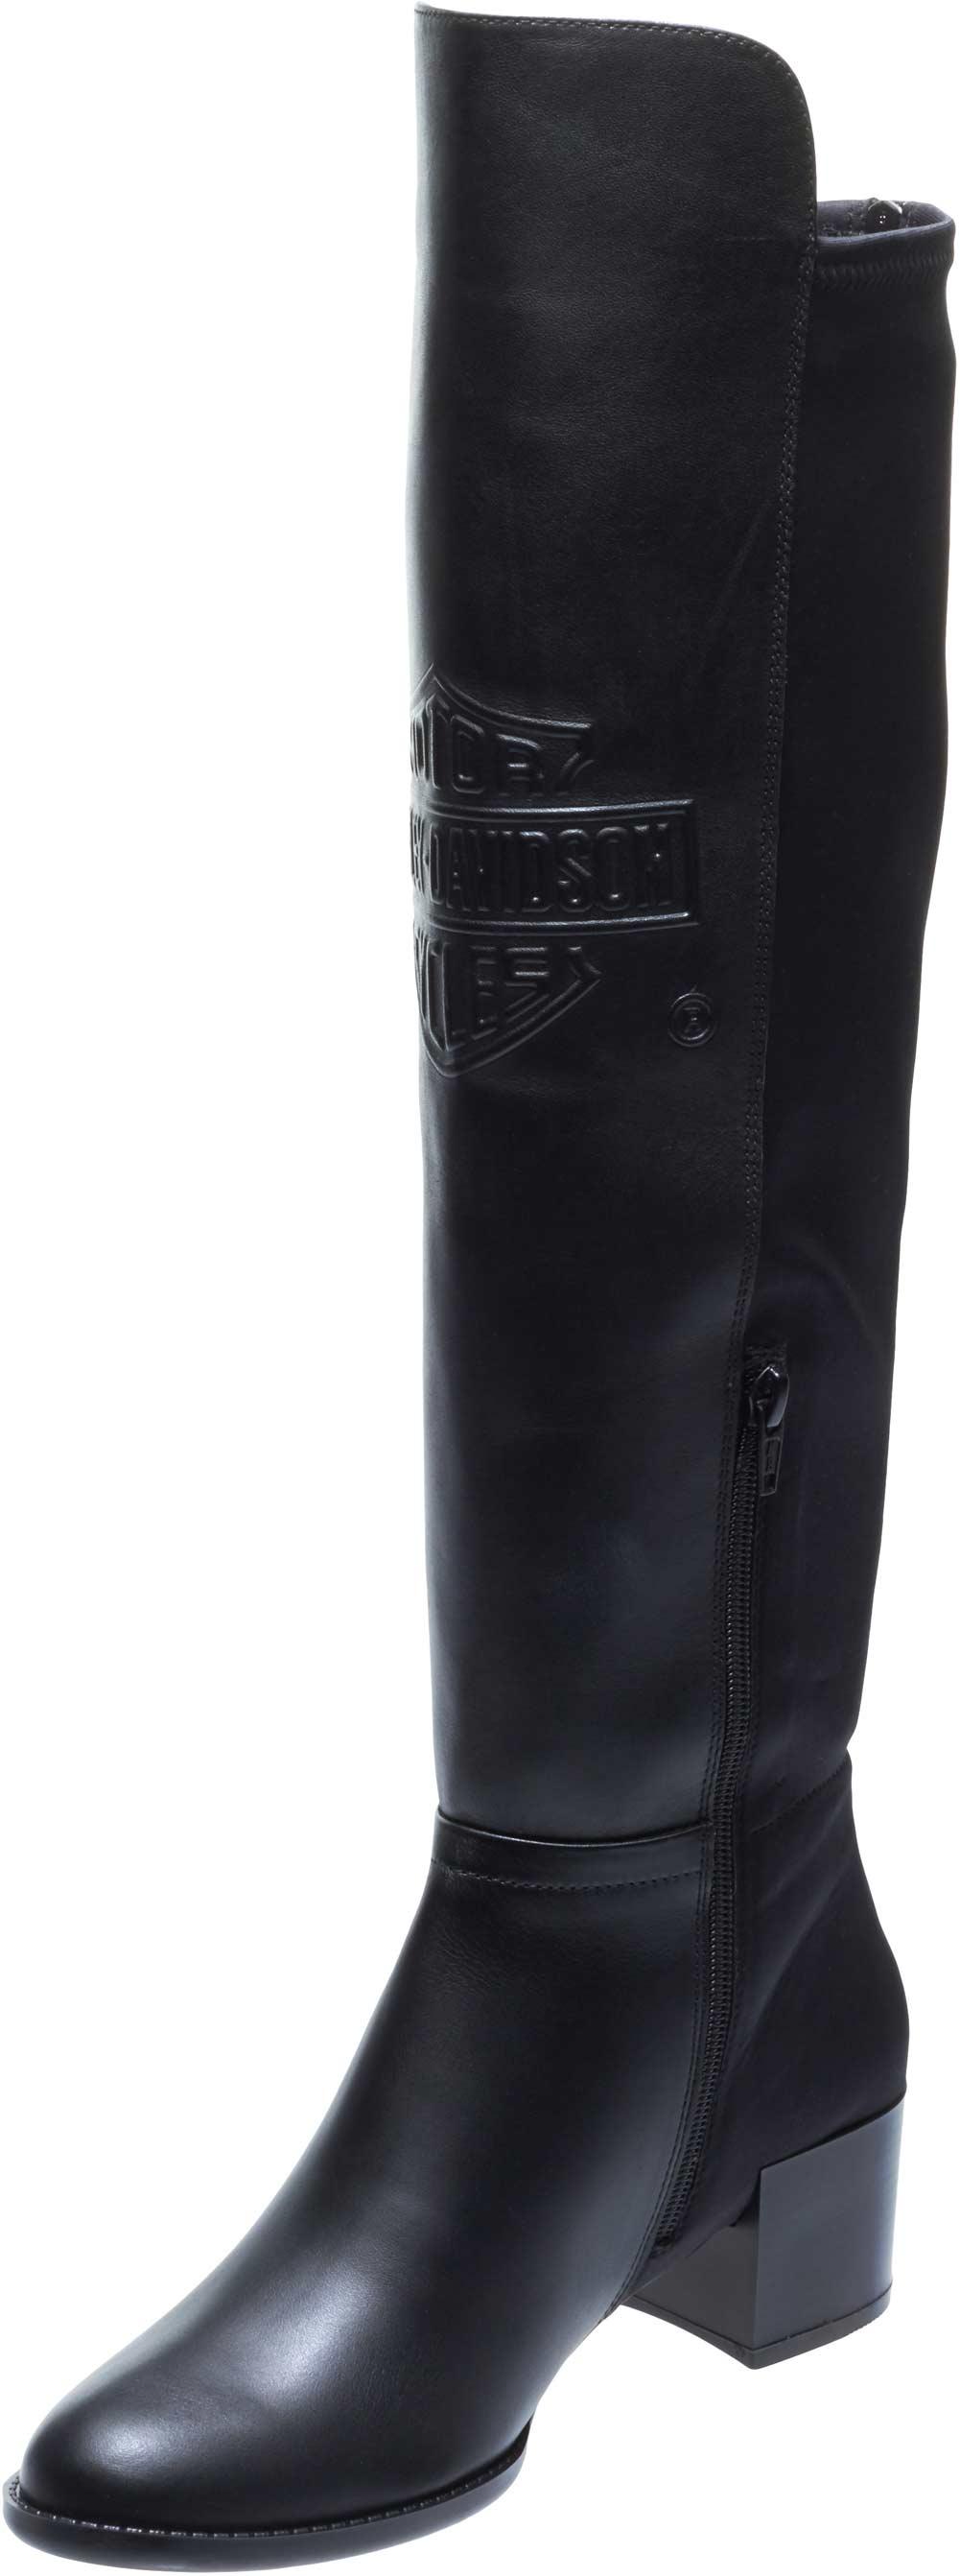 46070771965 Harley-Davidson Women s Delwood 18-Inch Knee-Hi Black Motorcycle Boots  D84111